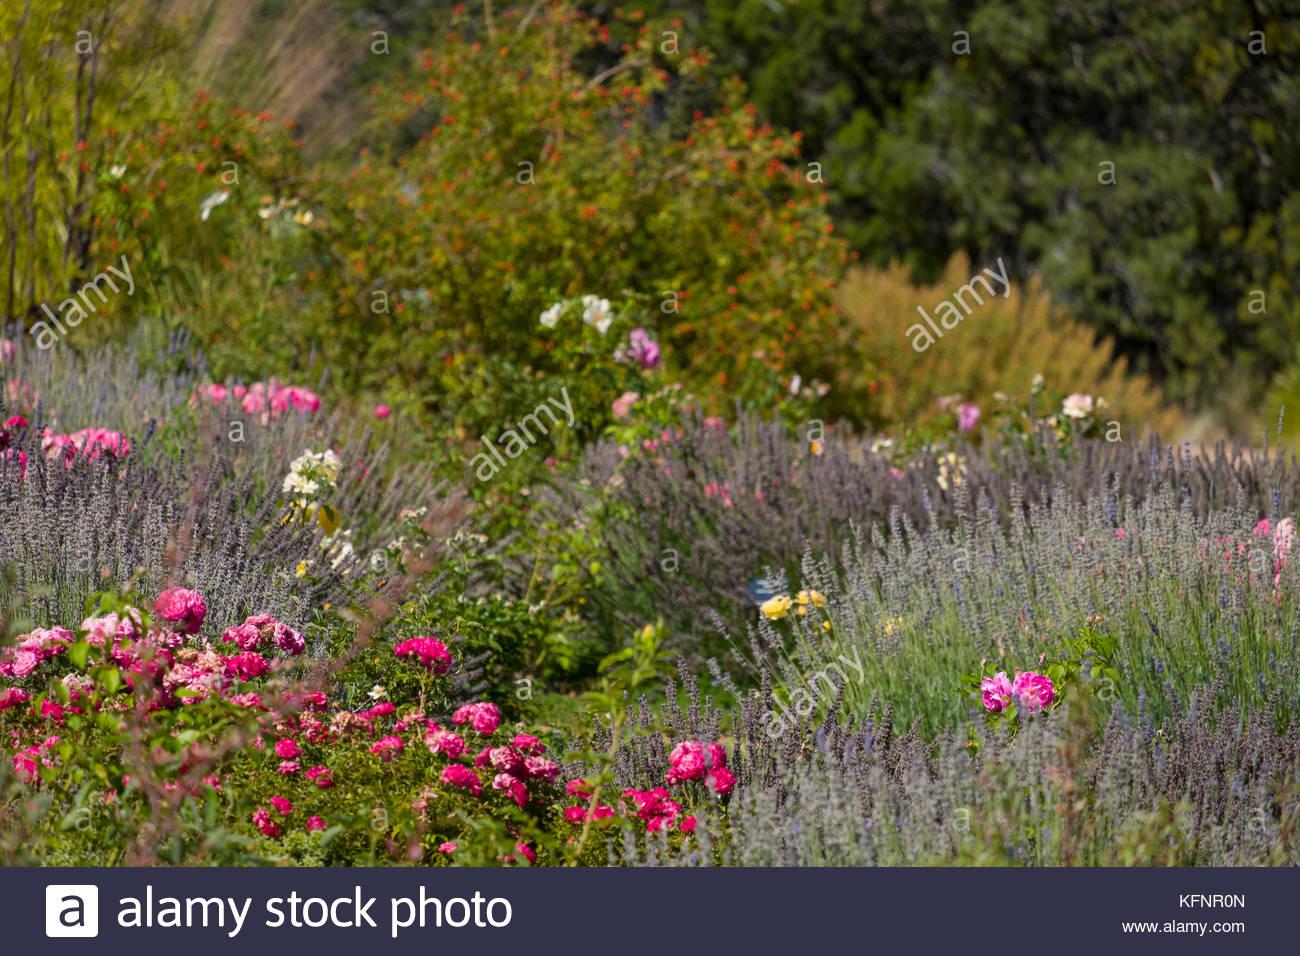 Colorful Flowers In The Santa Fe Botanical Garden At Museum Hill, Santa Fe,  Santa